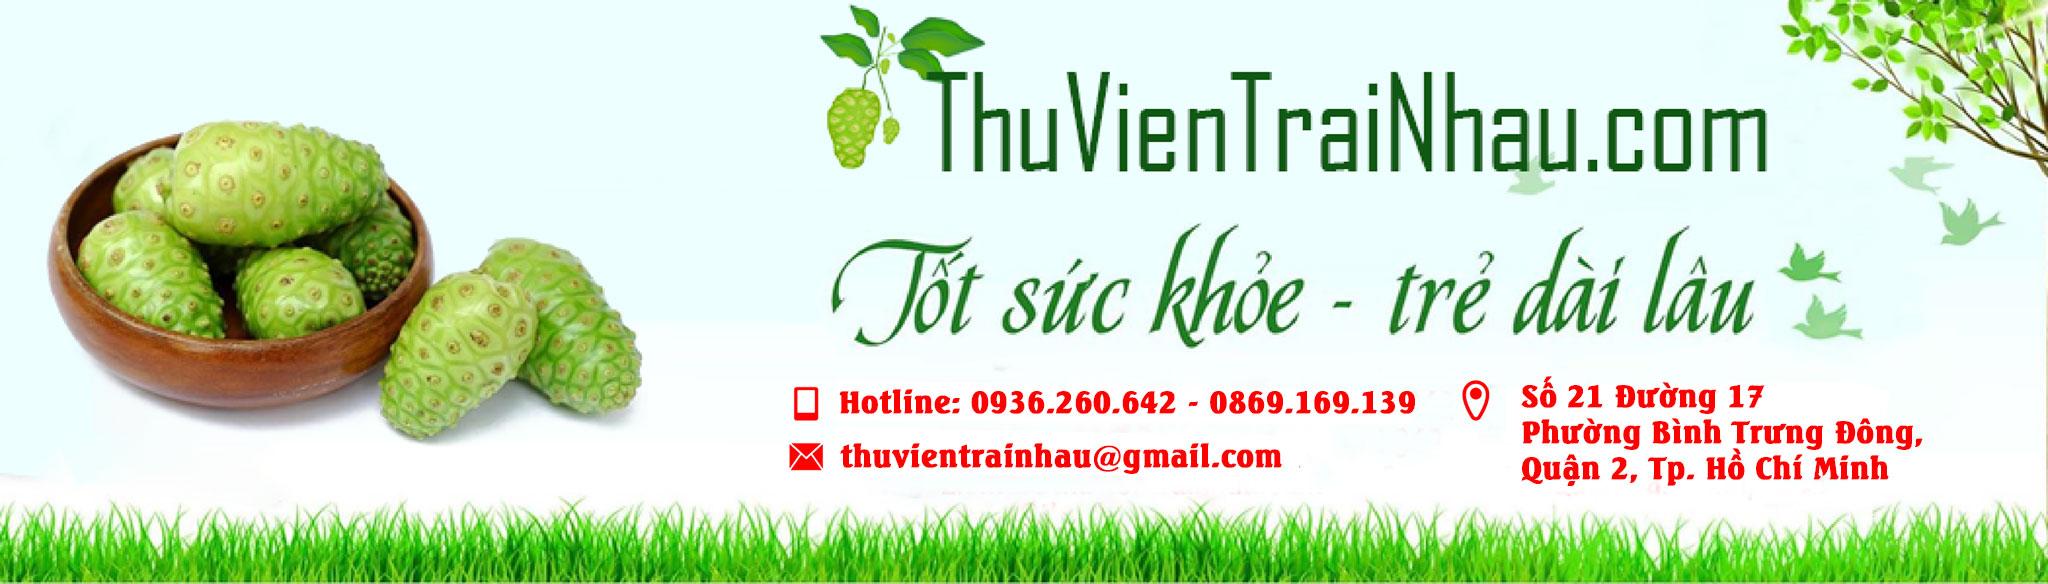 website thuvientrainhau.com công ty STARFOODS VIỆT NAM